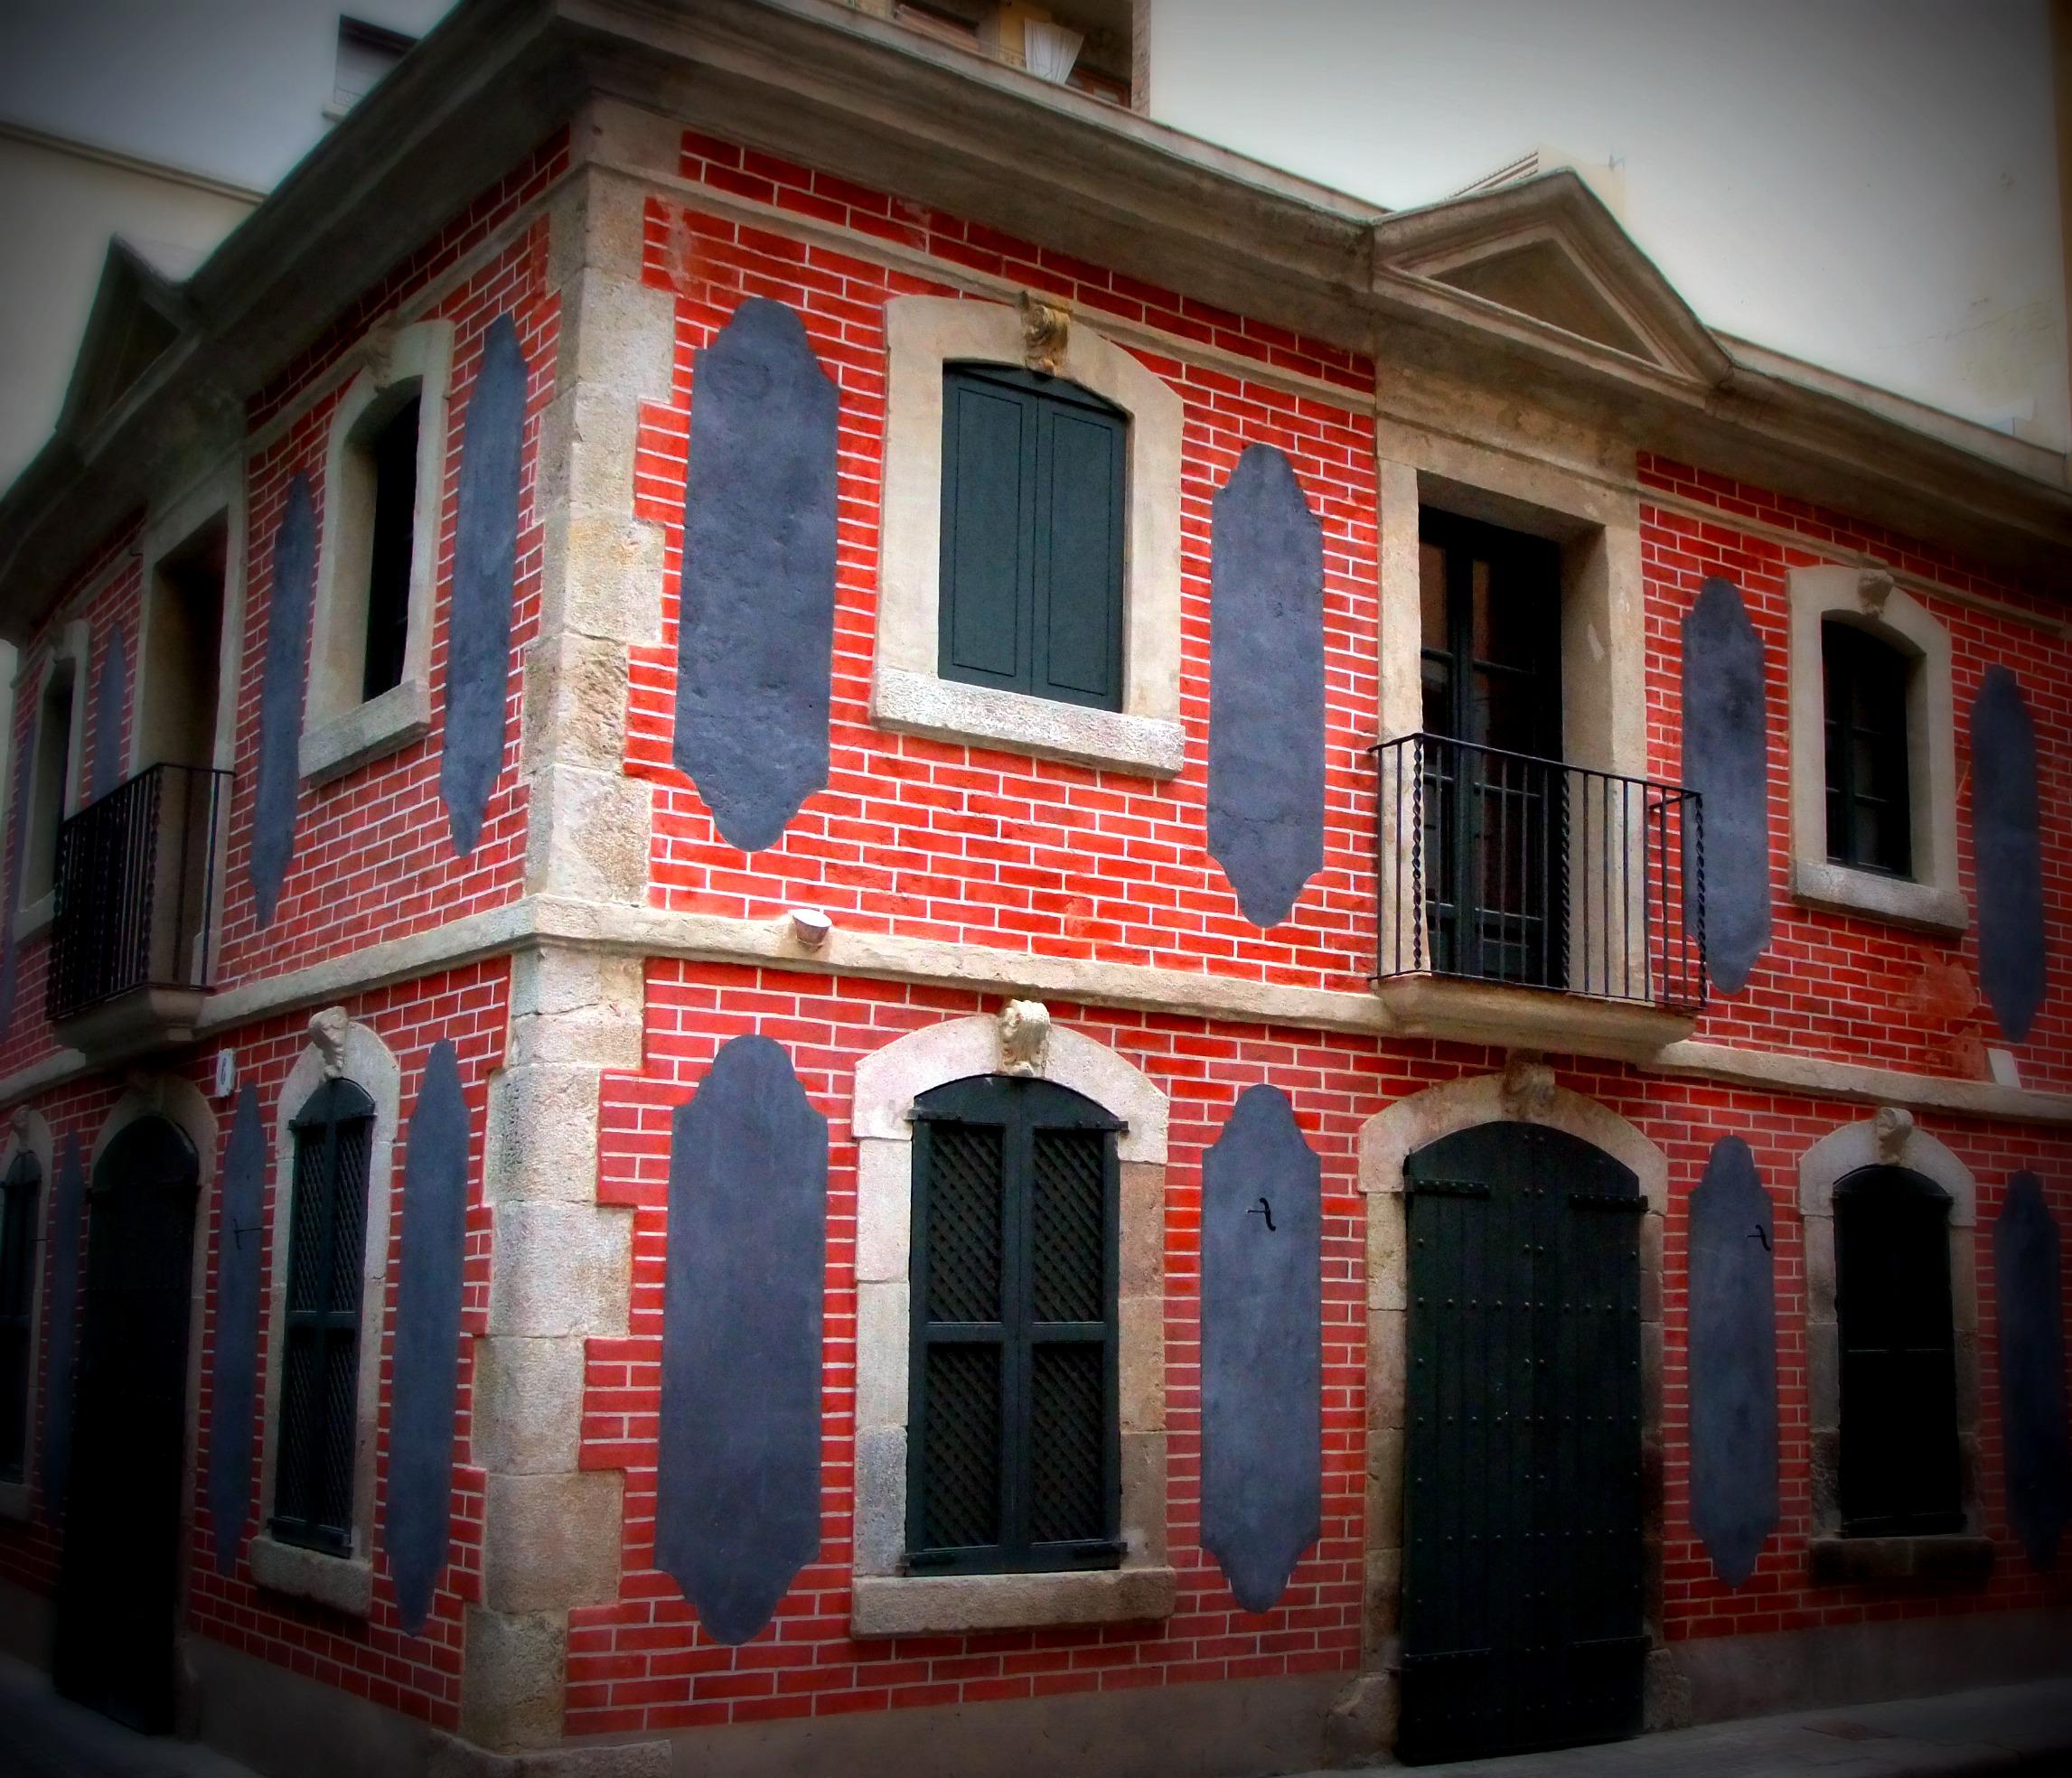 La casa de la barceloneta 1761 unica barcelona - Apartamentos en la barceloneta ...